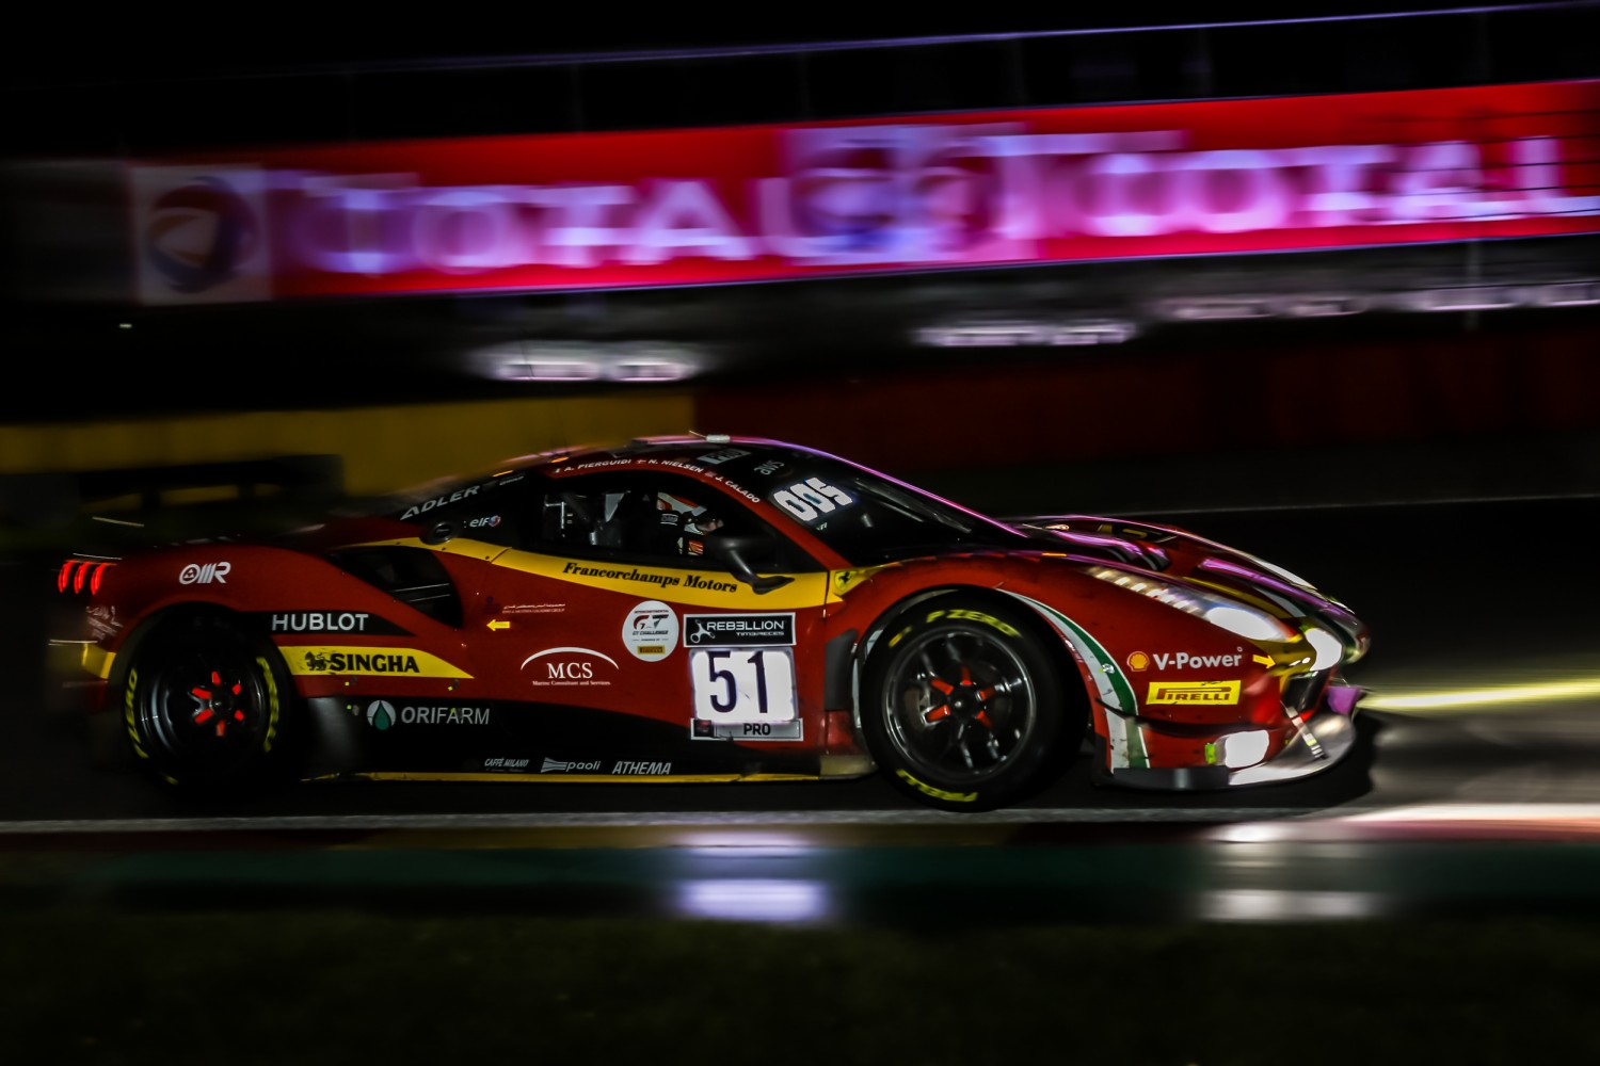 15-hour update: did the leading Ferrari make a tactical mistake?